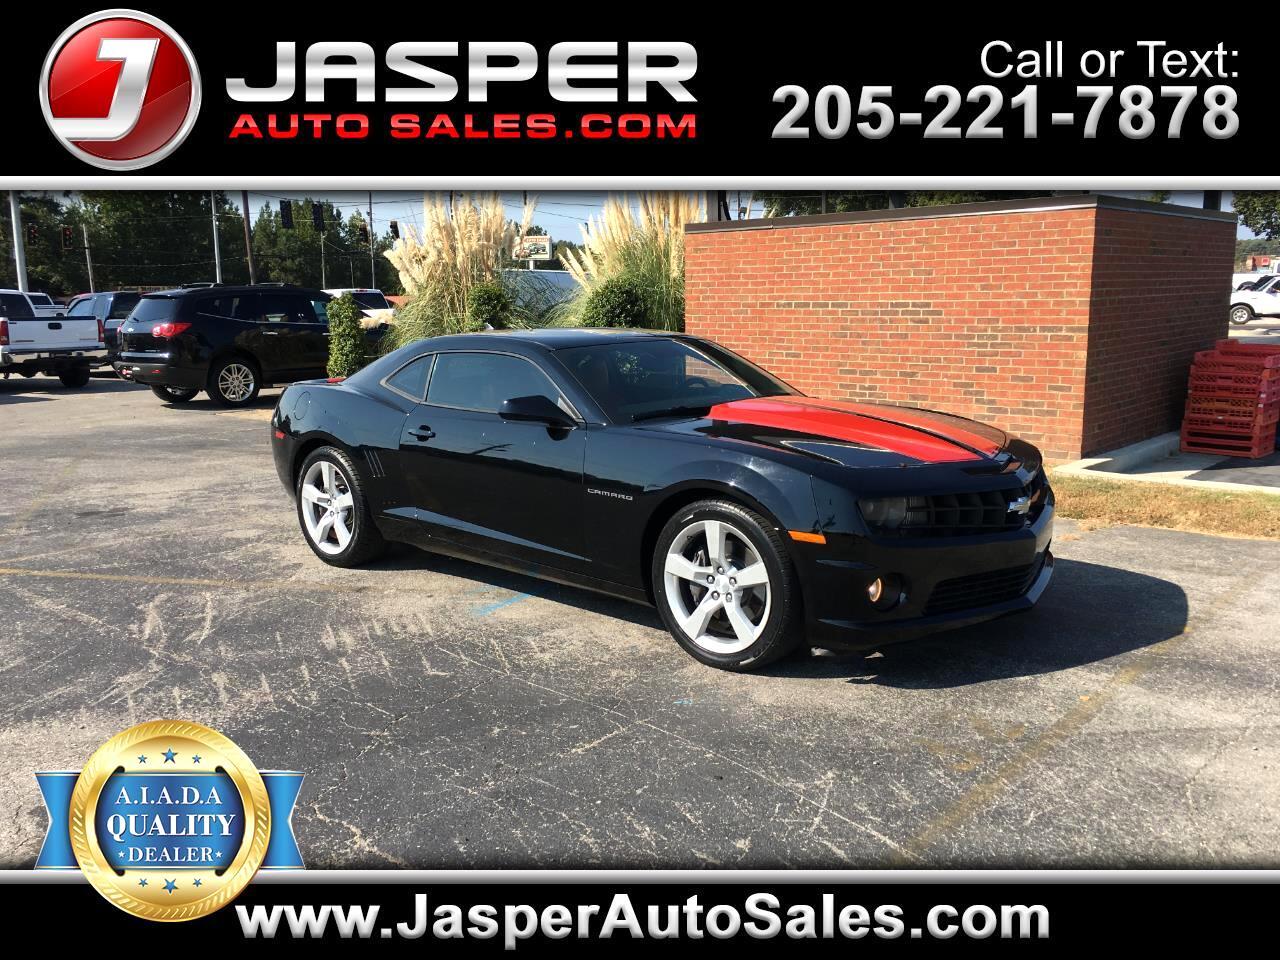 Jasper Car Lots >> Jasper Car Lots Best Upcoming Car Release 2020